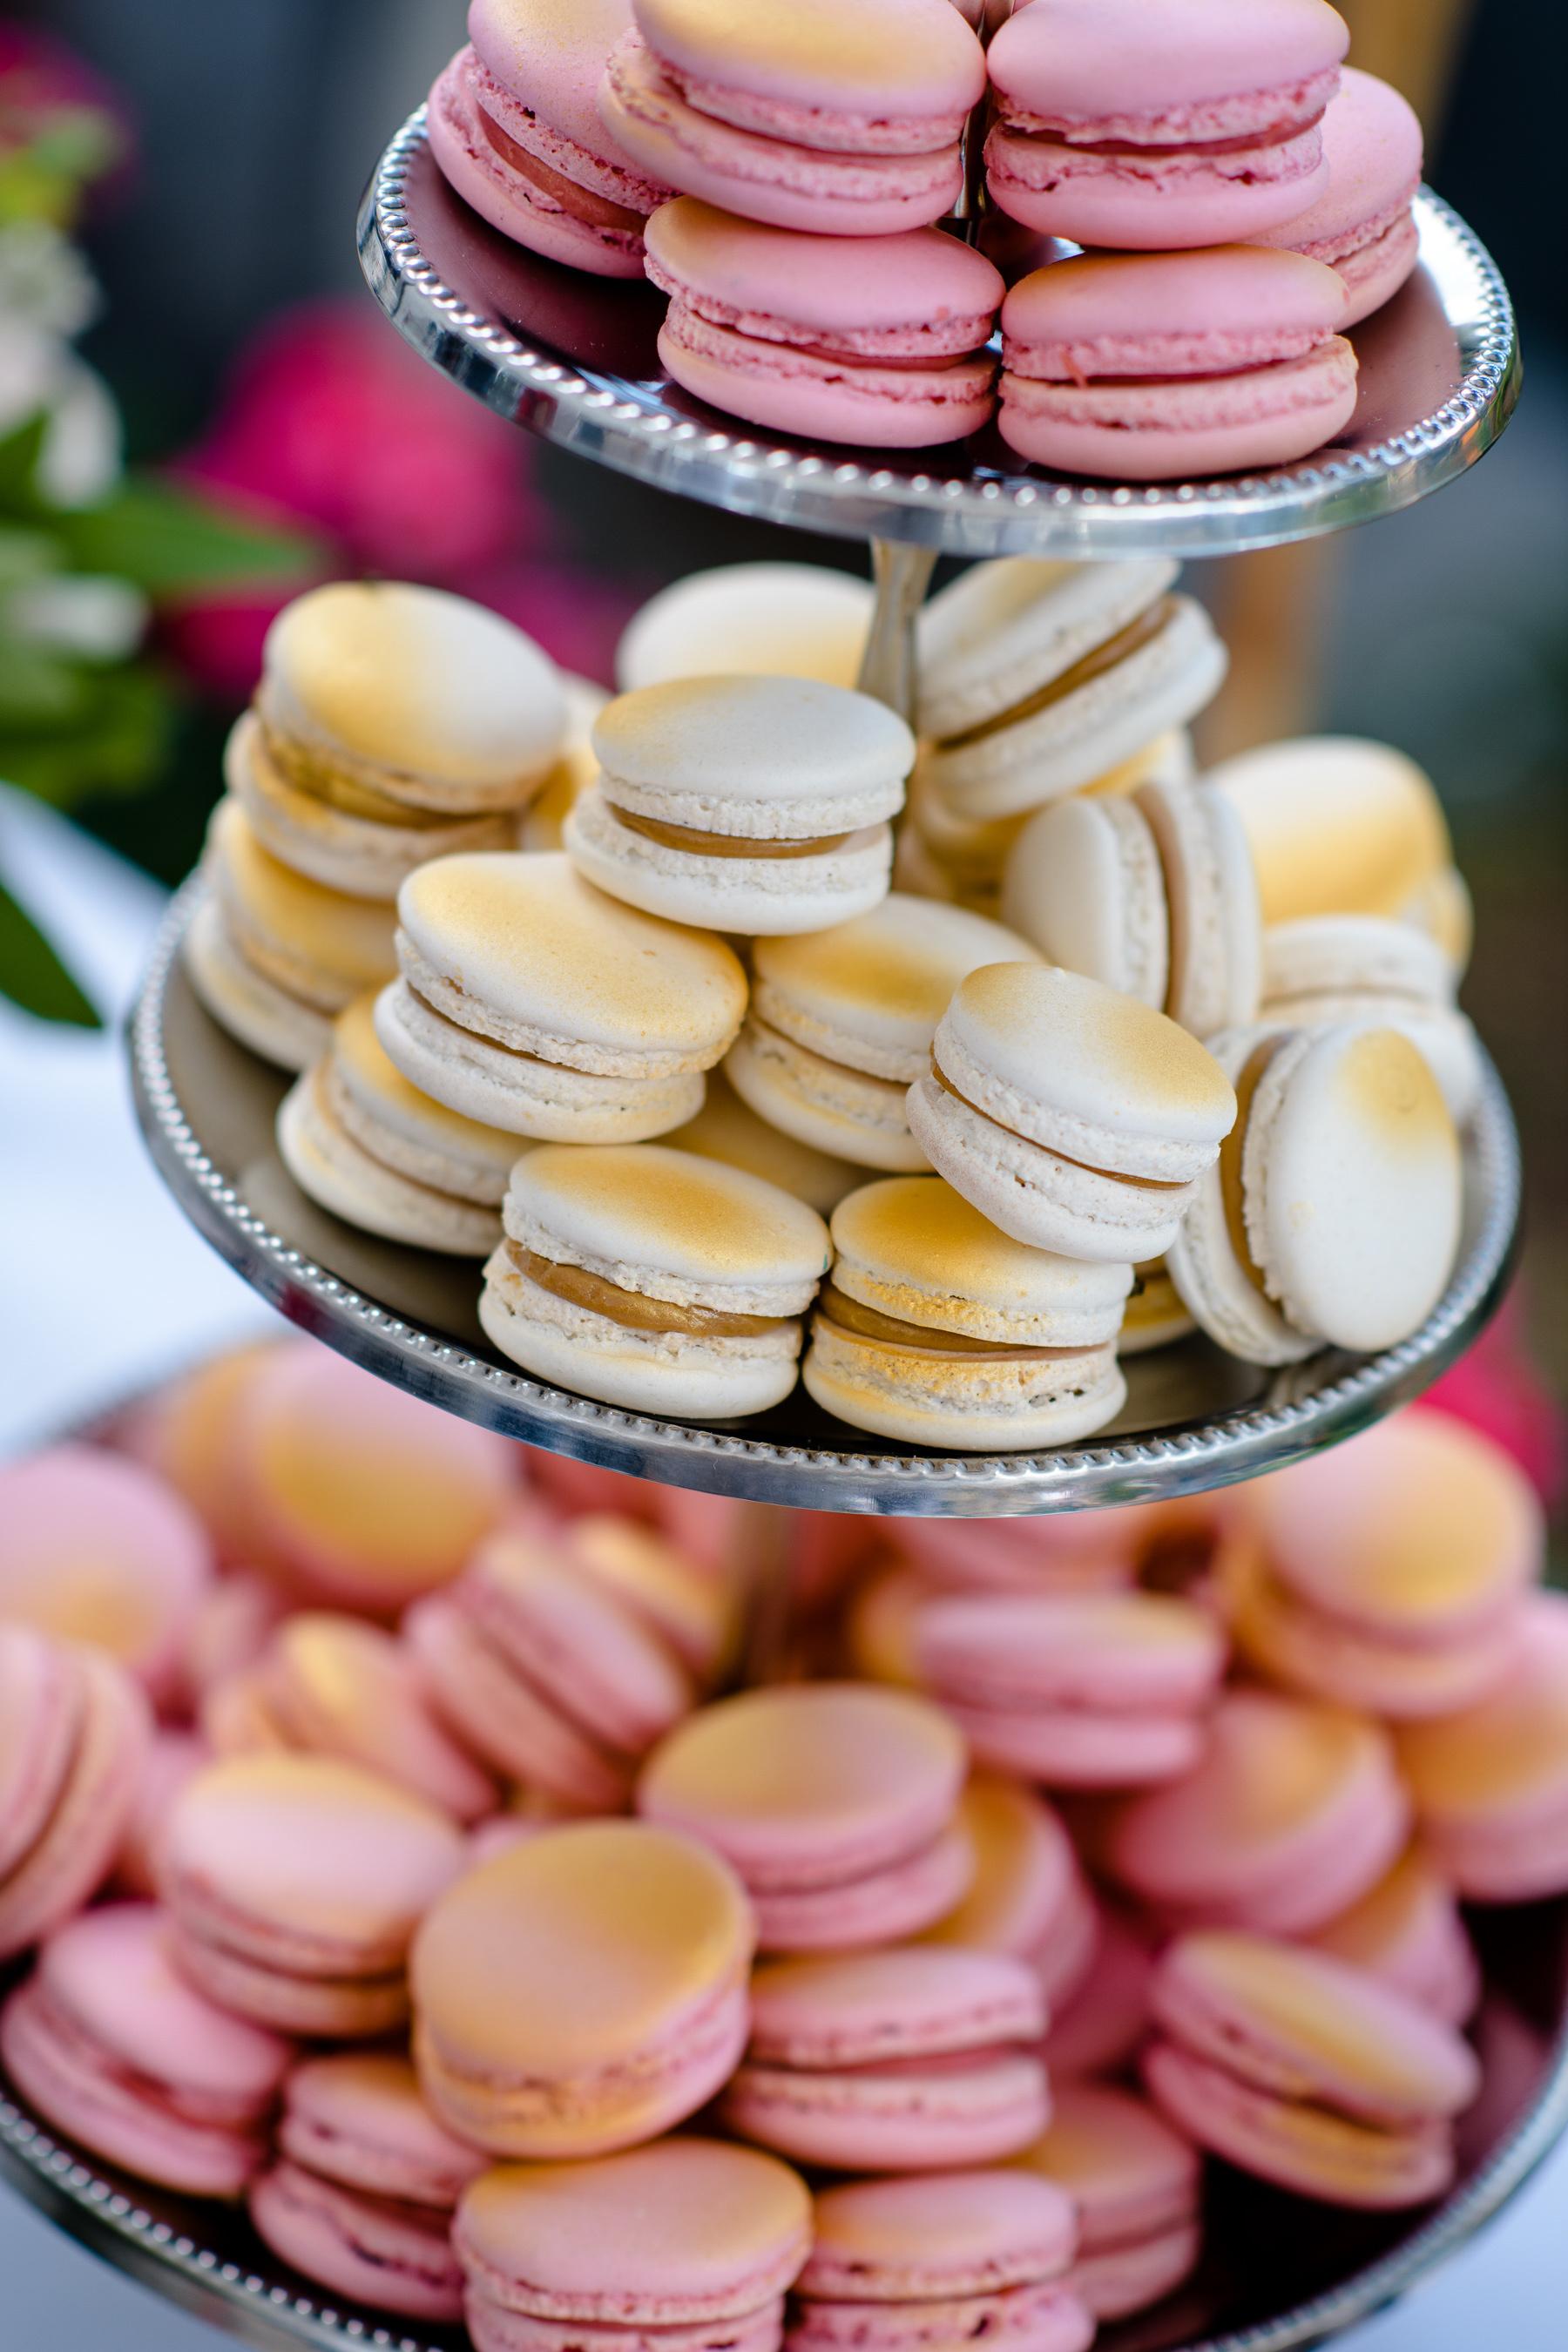 Glanzmomente-Clostermanns Hof-Macarons